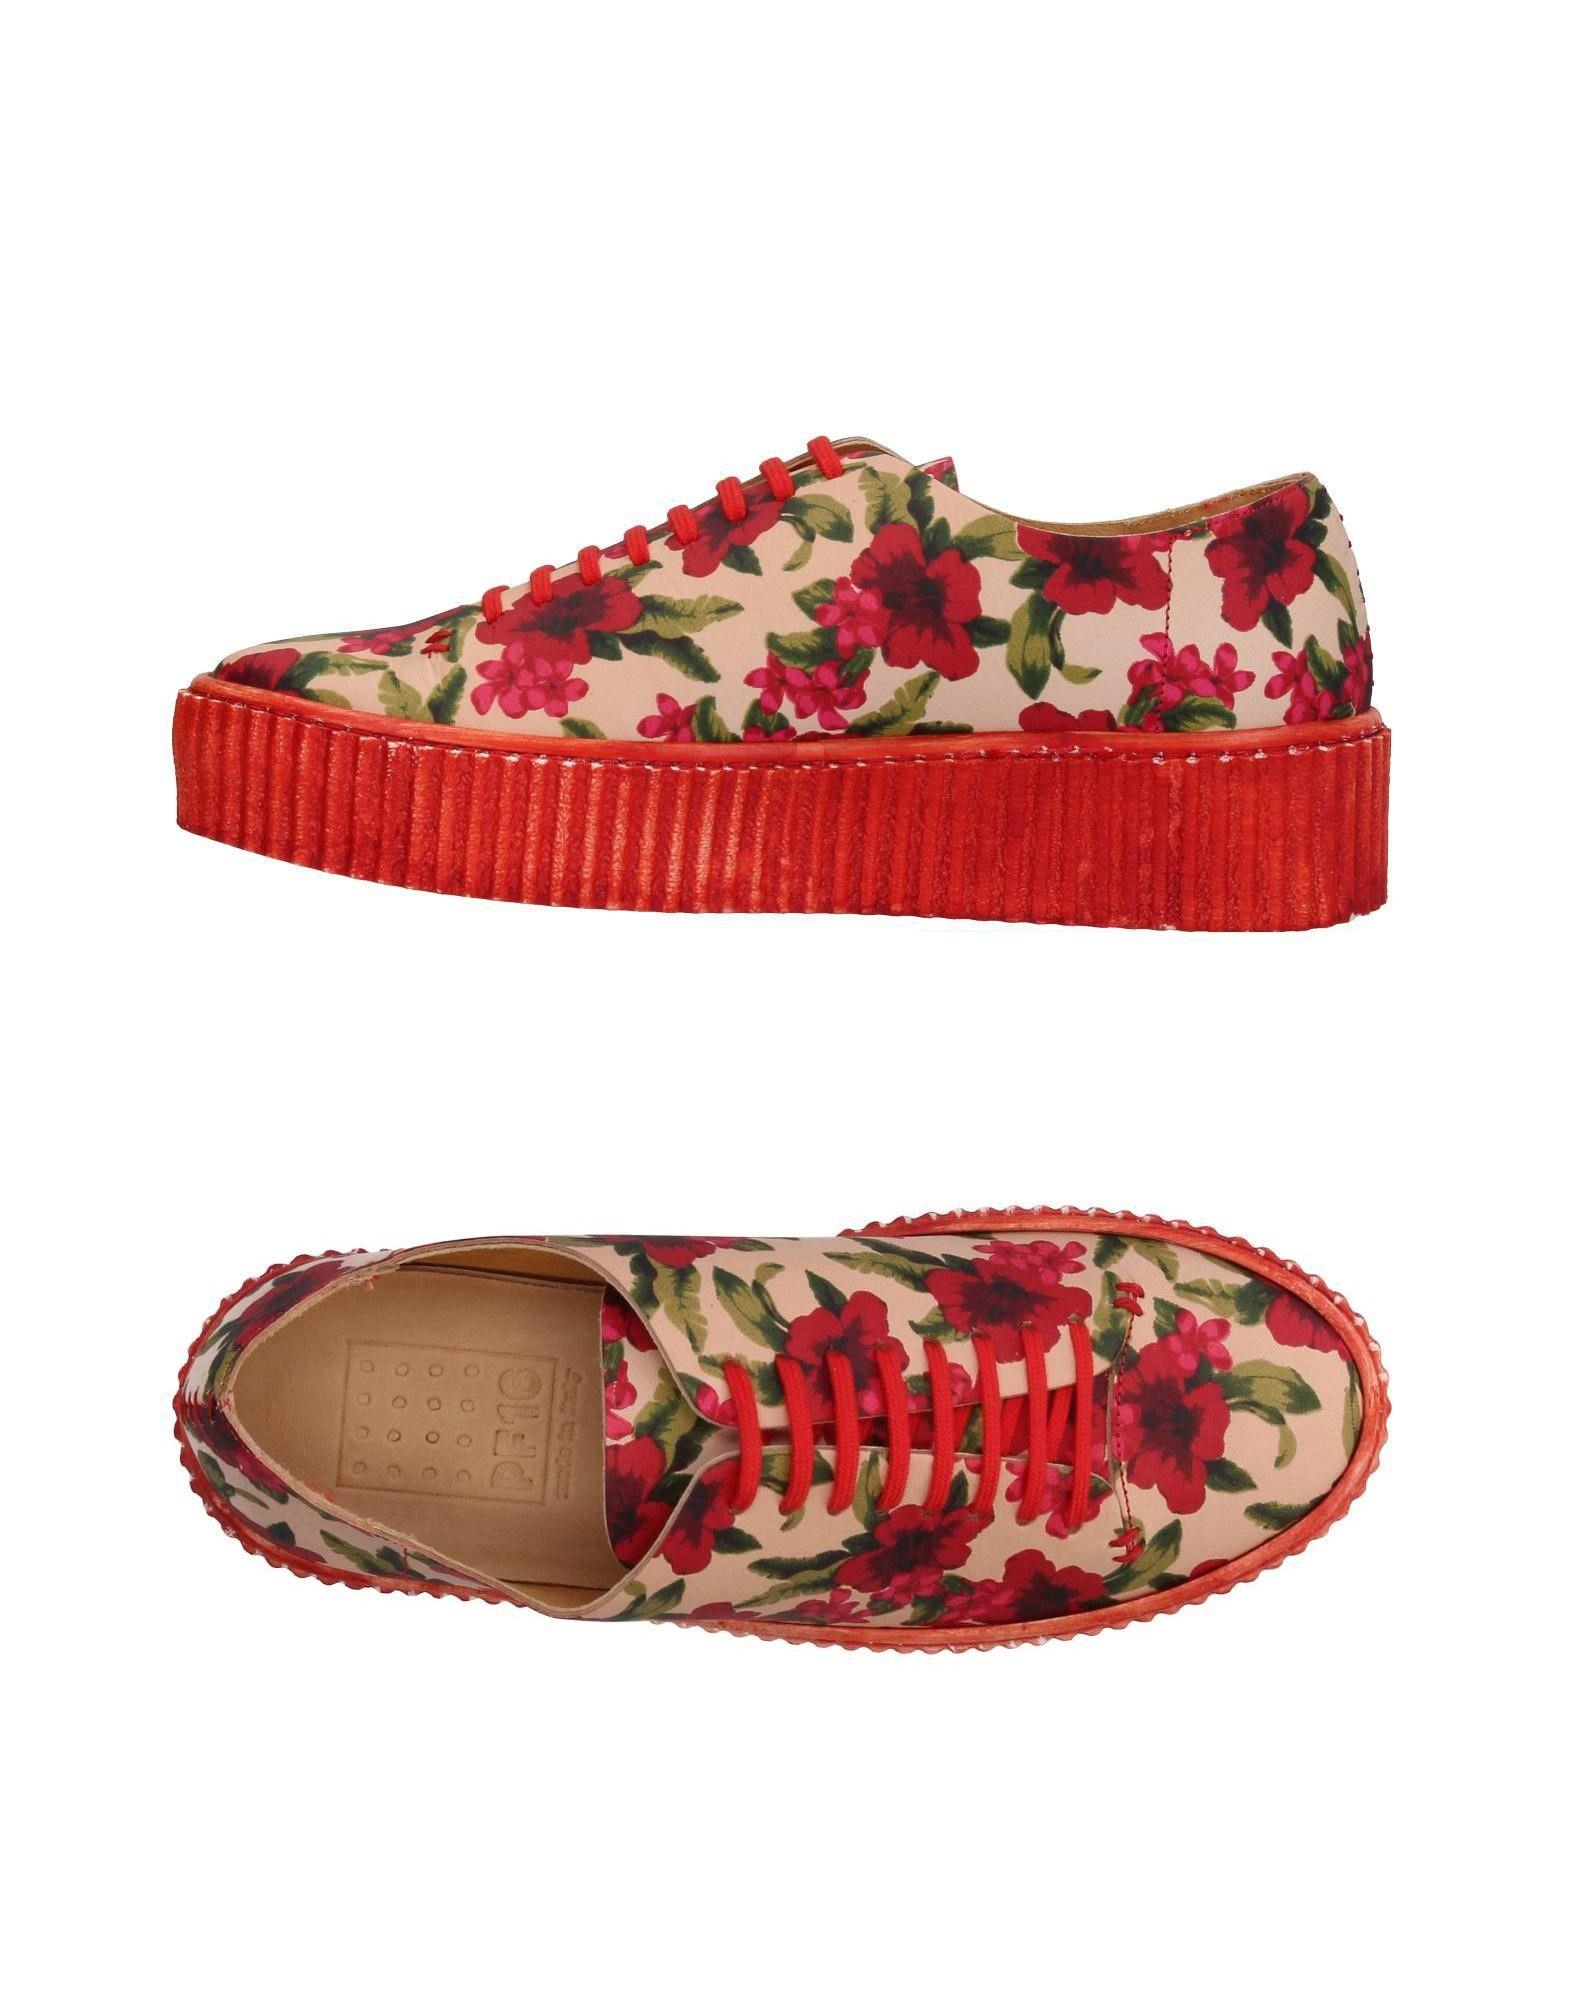 PF16 Обувь на шнурках первый внутри обувь обувь обувь обувь обувь обувь обувь обувь обувь 8a2549